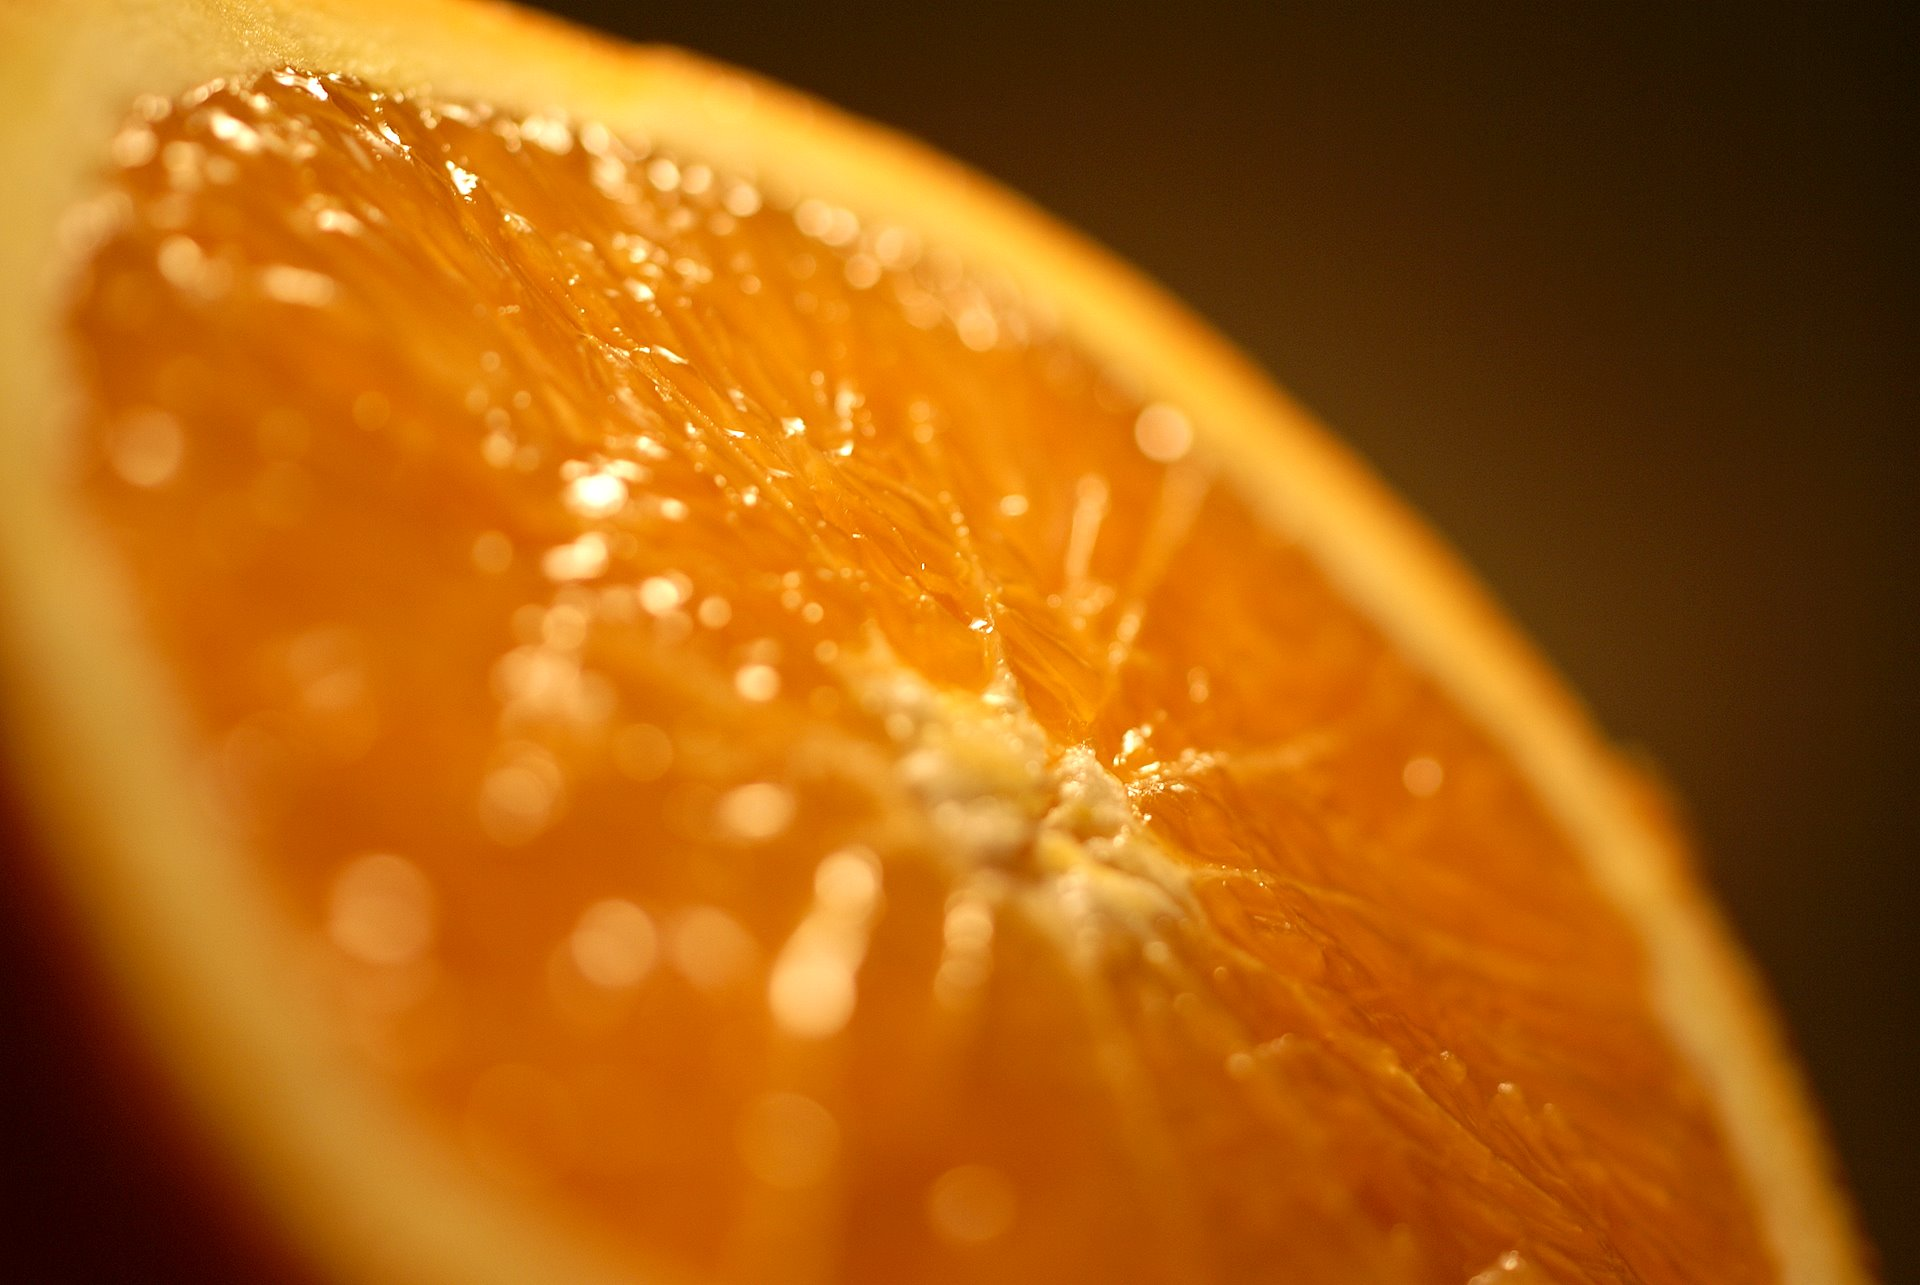 Апельсин Orange  № 2933029 без смс